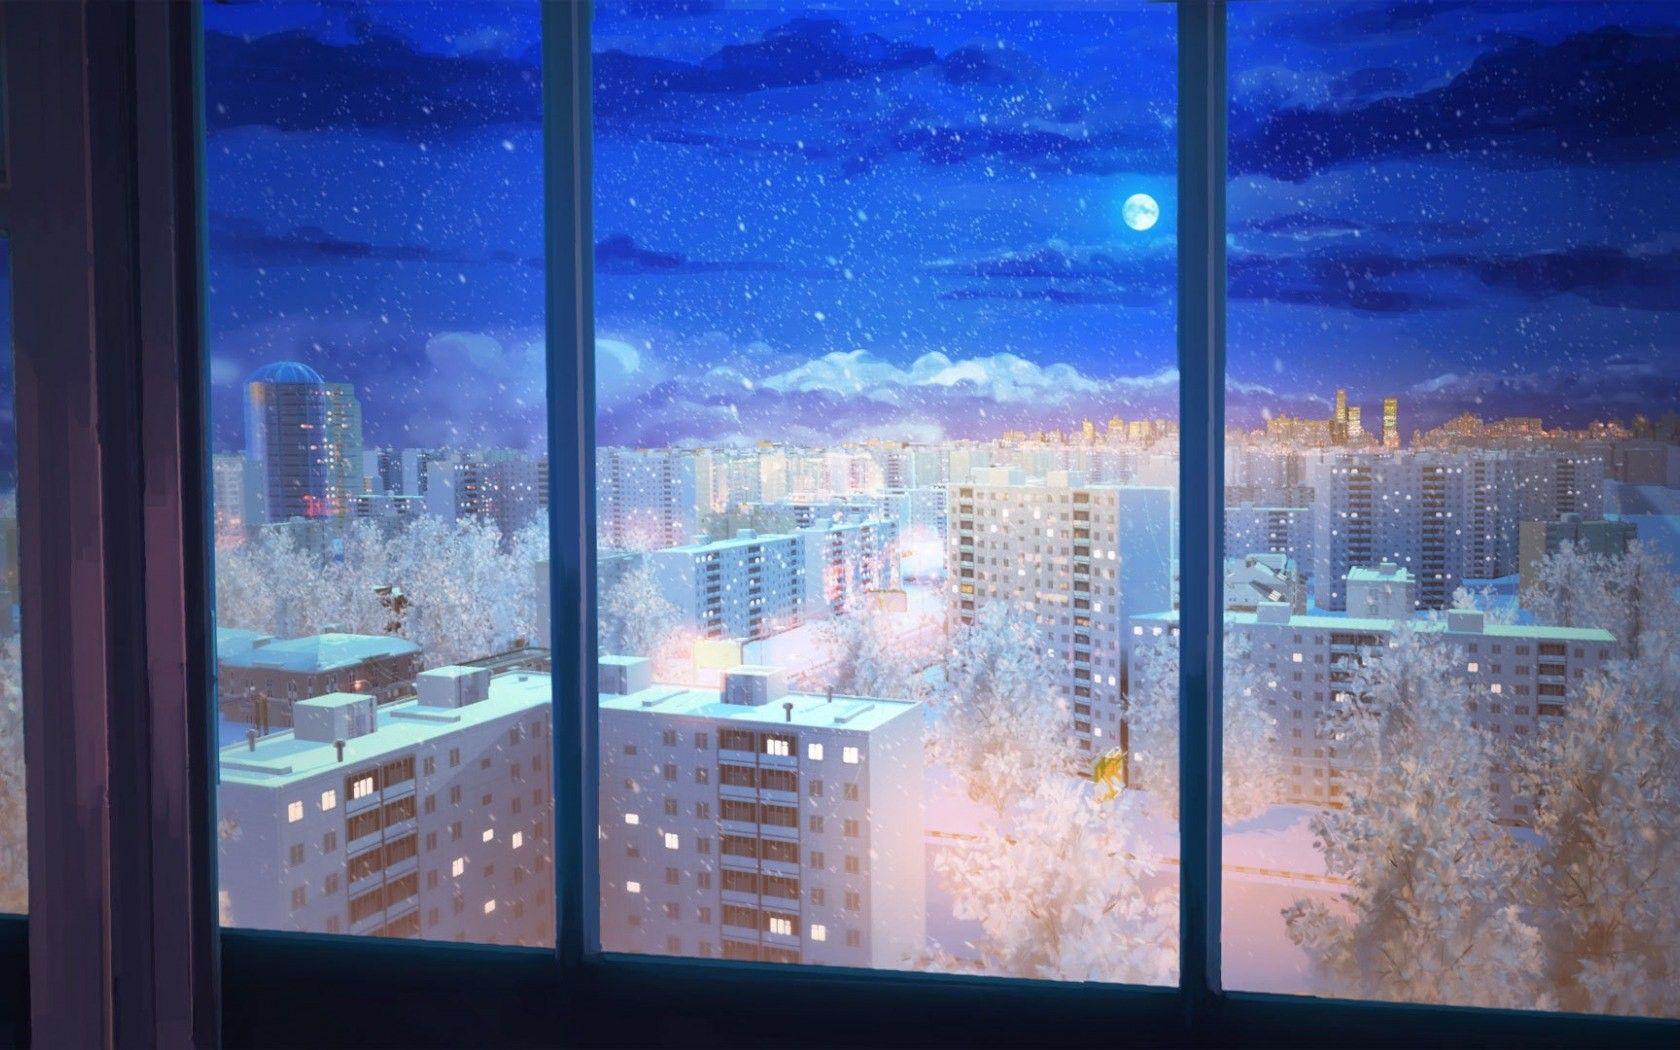 Cozy view [16801050] Anime scenery wallpaper, Anime